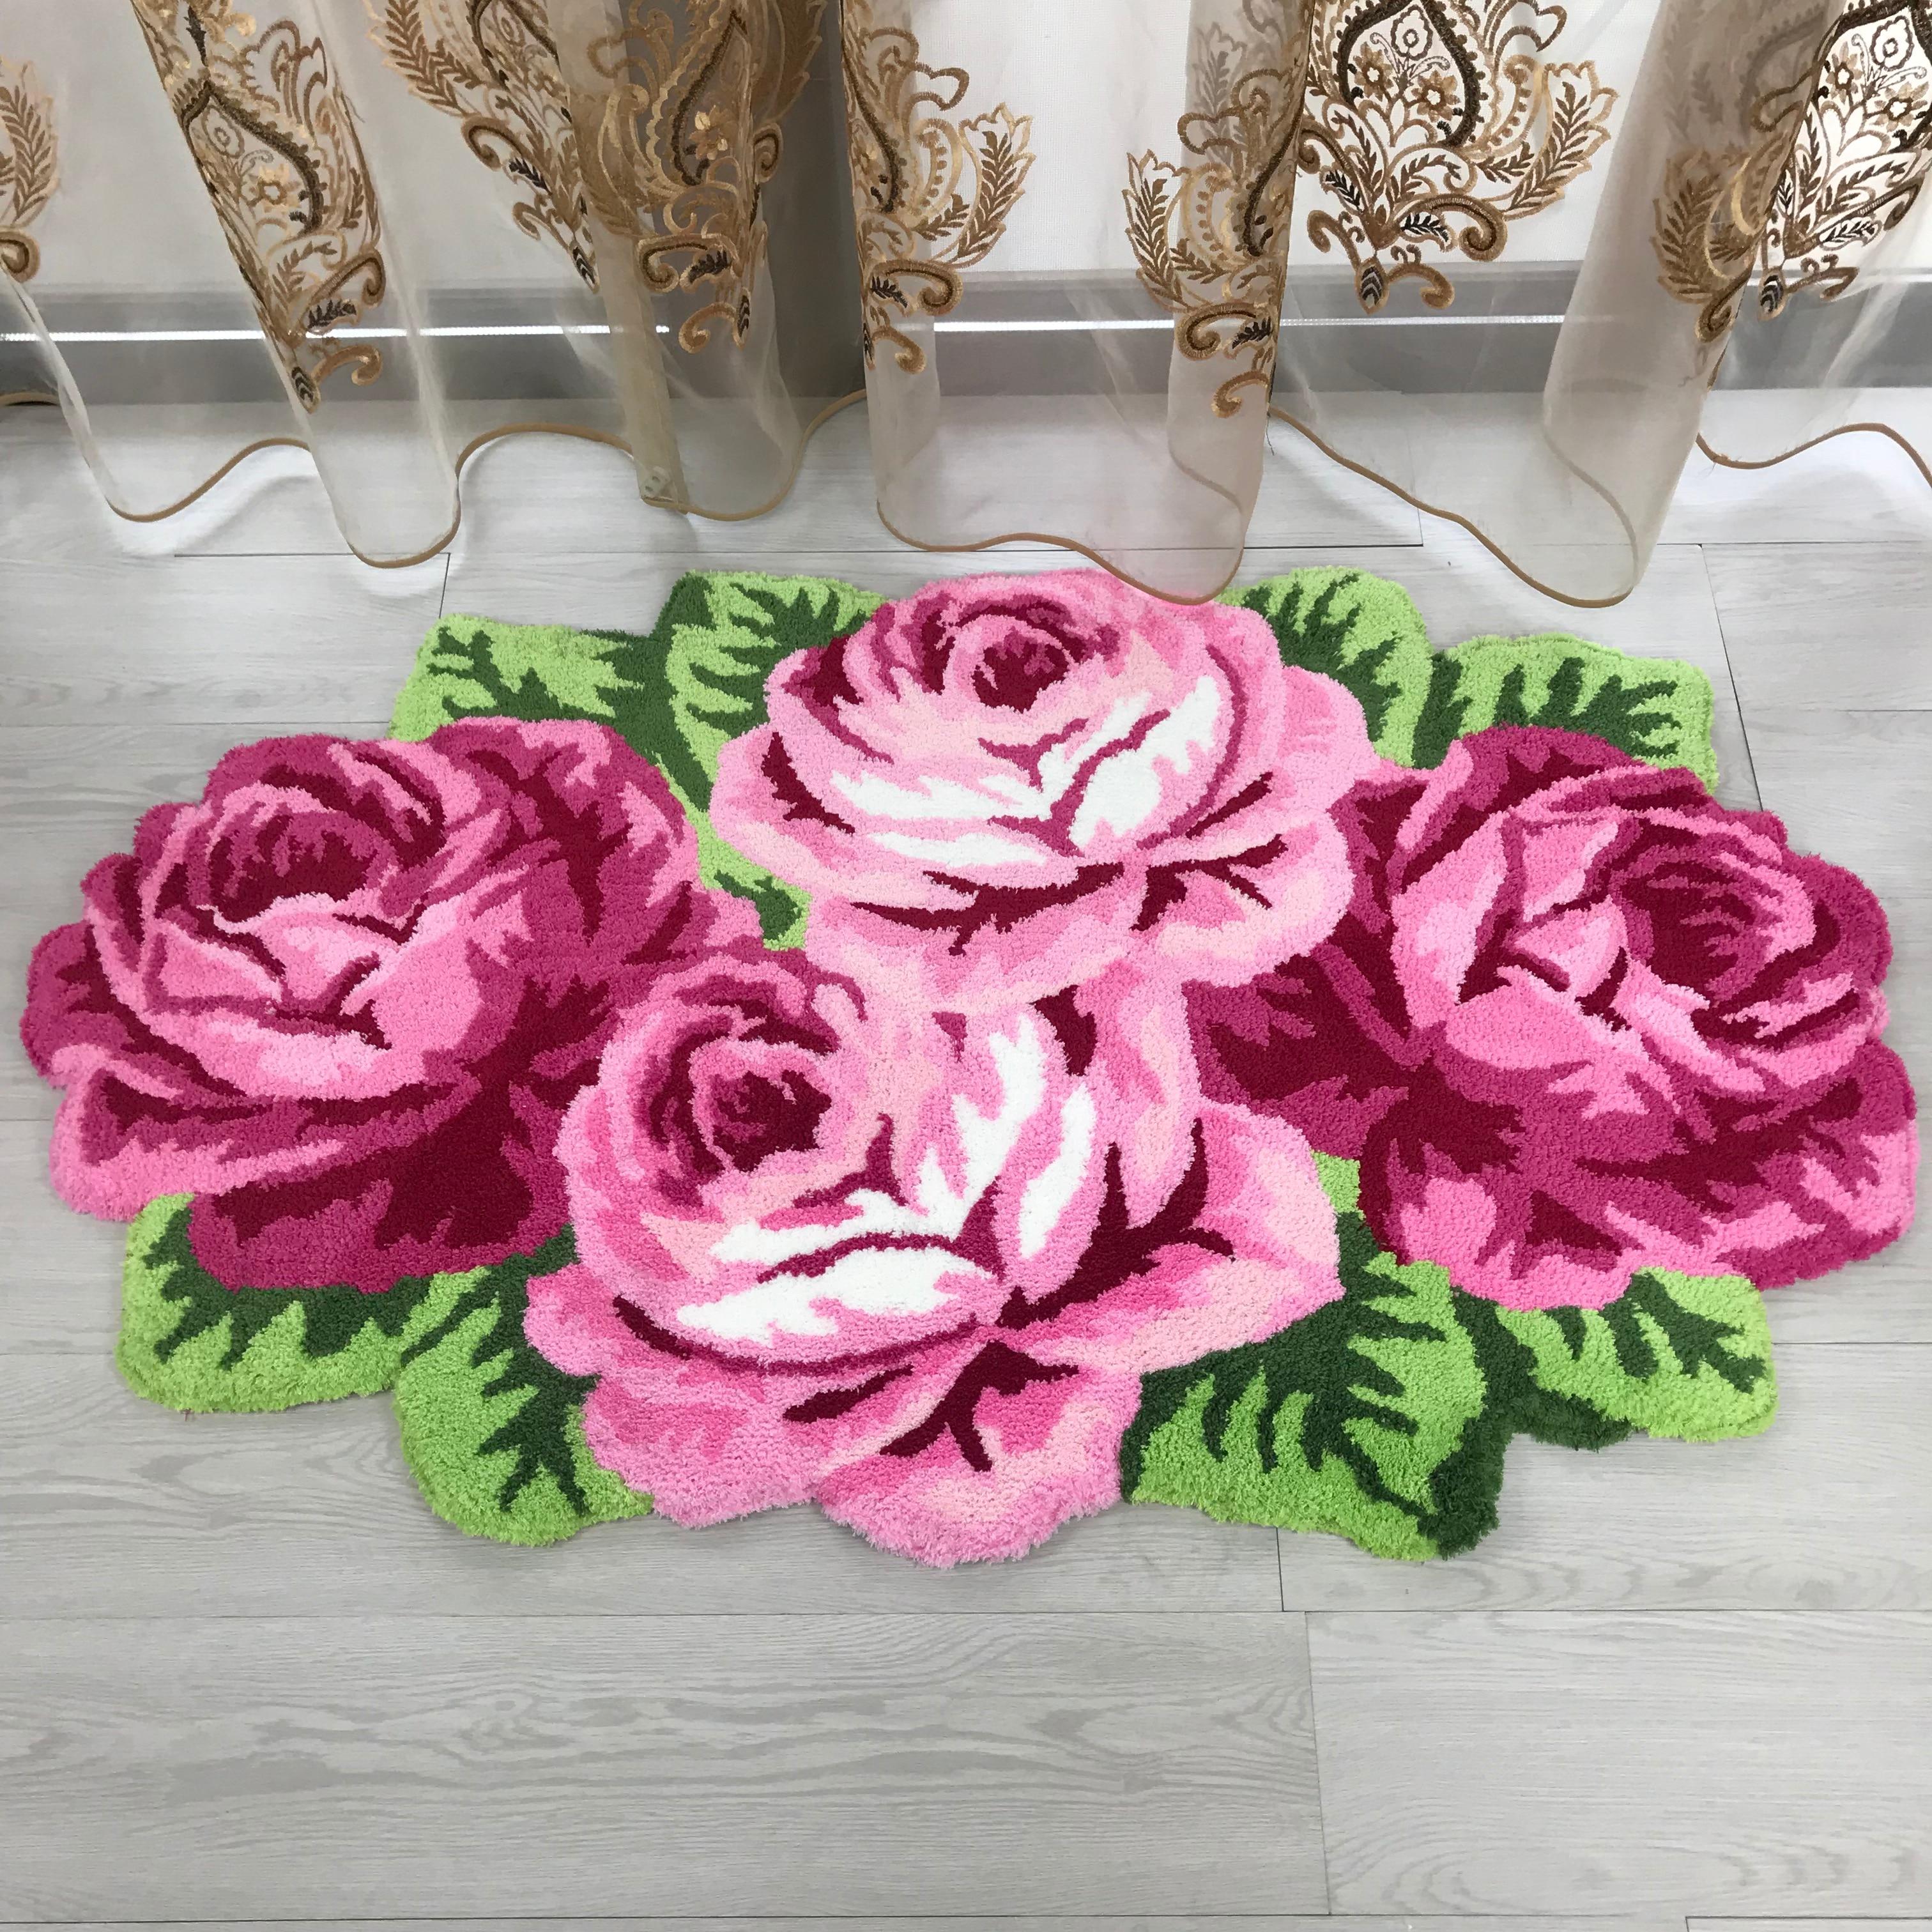 Bonne qualité rose rose tapis rose tapis violet tapis rose